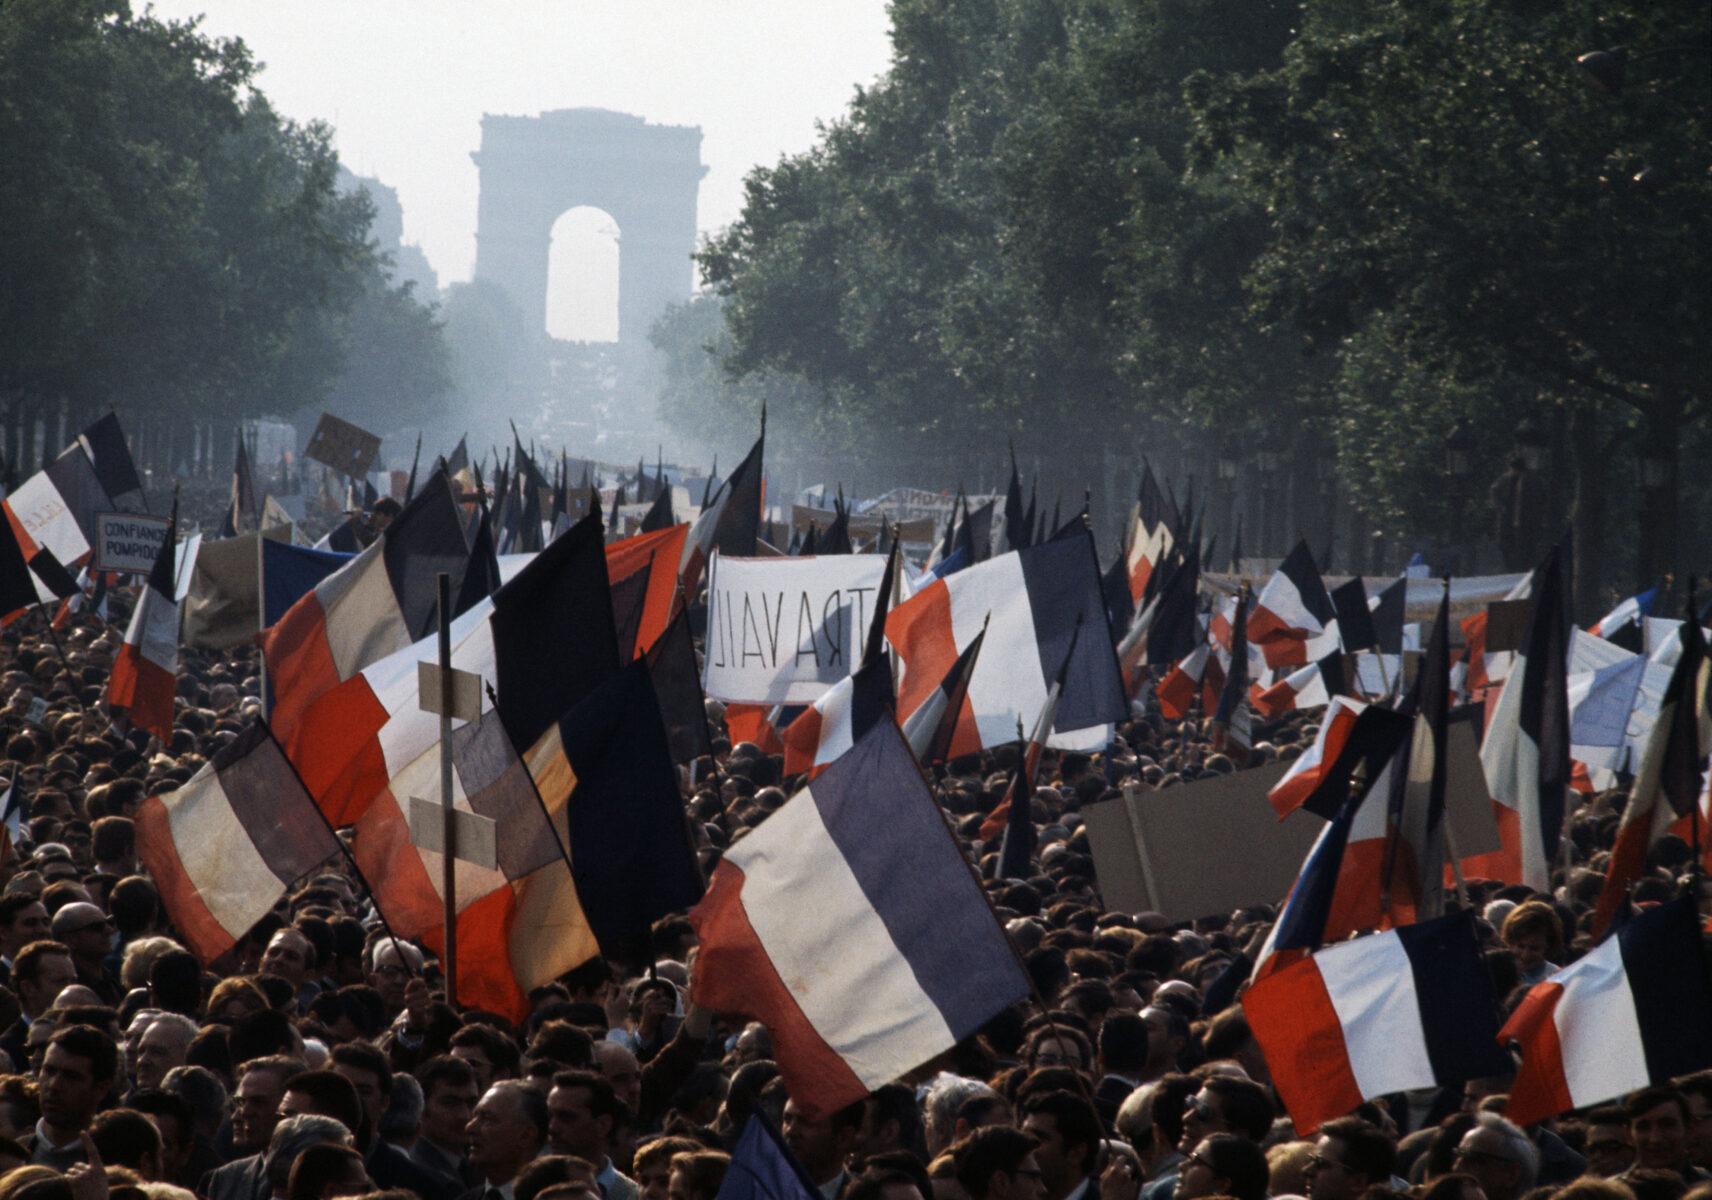 Farbfoto von Bruno Barbey. Pariser Proteste, Mai 1968. Frankreich, Flaggen, Champs Elysees